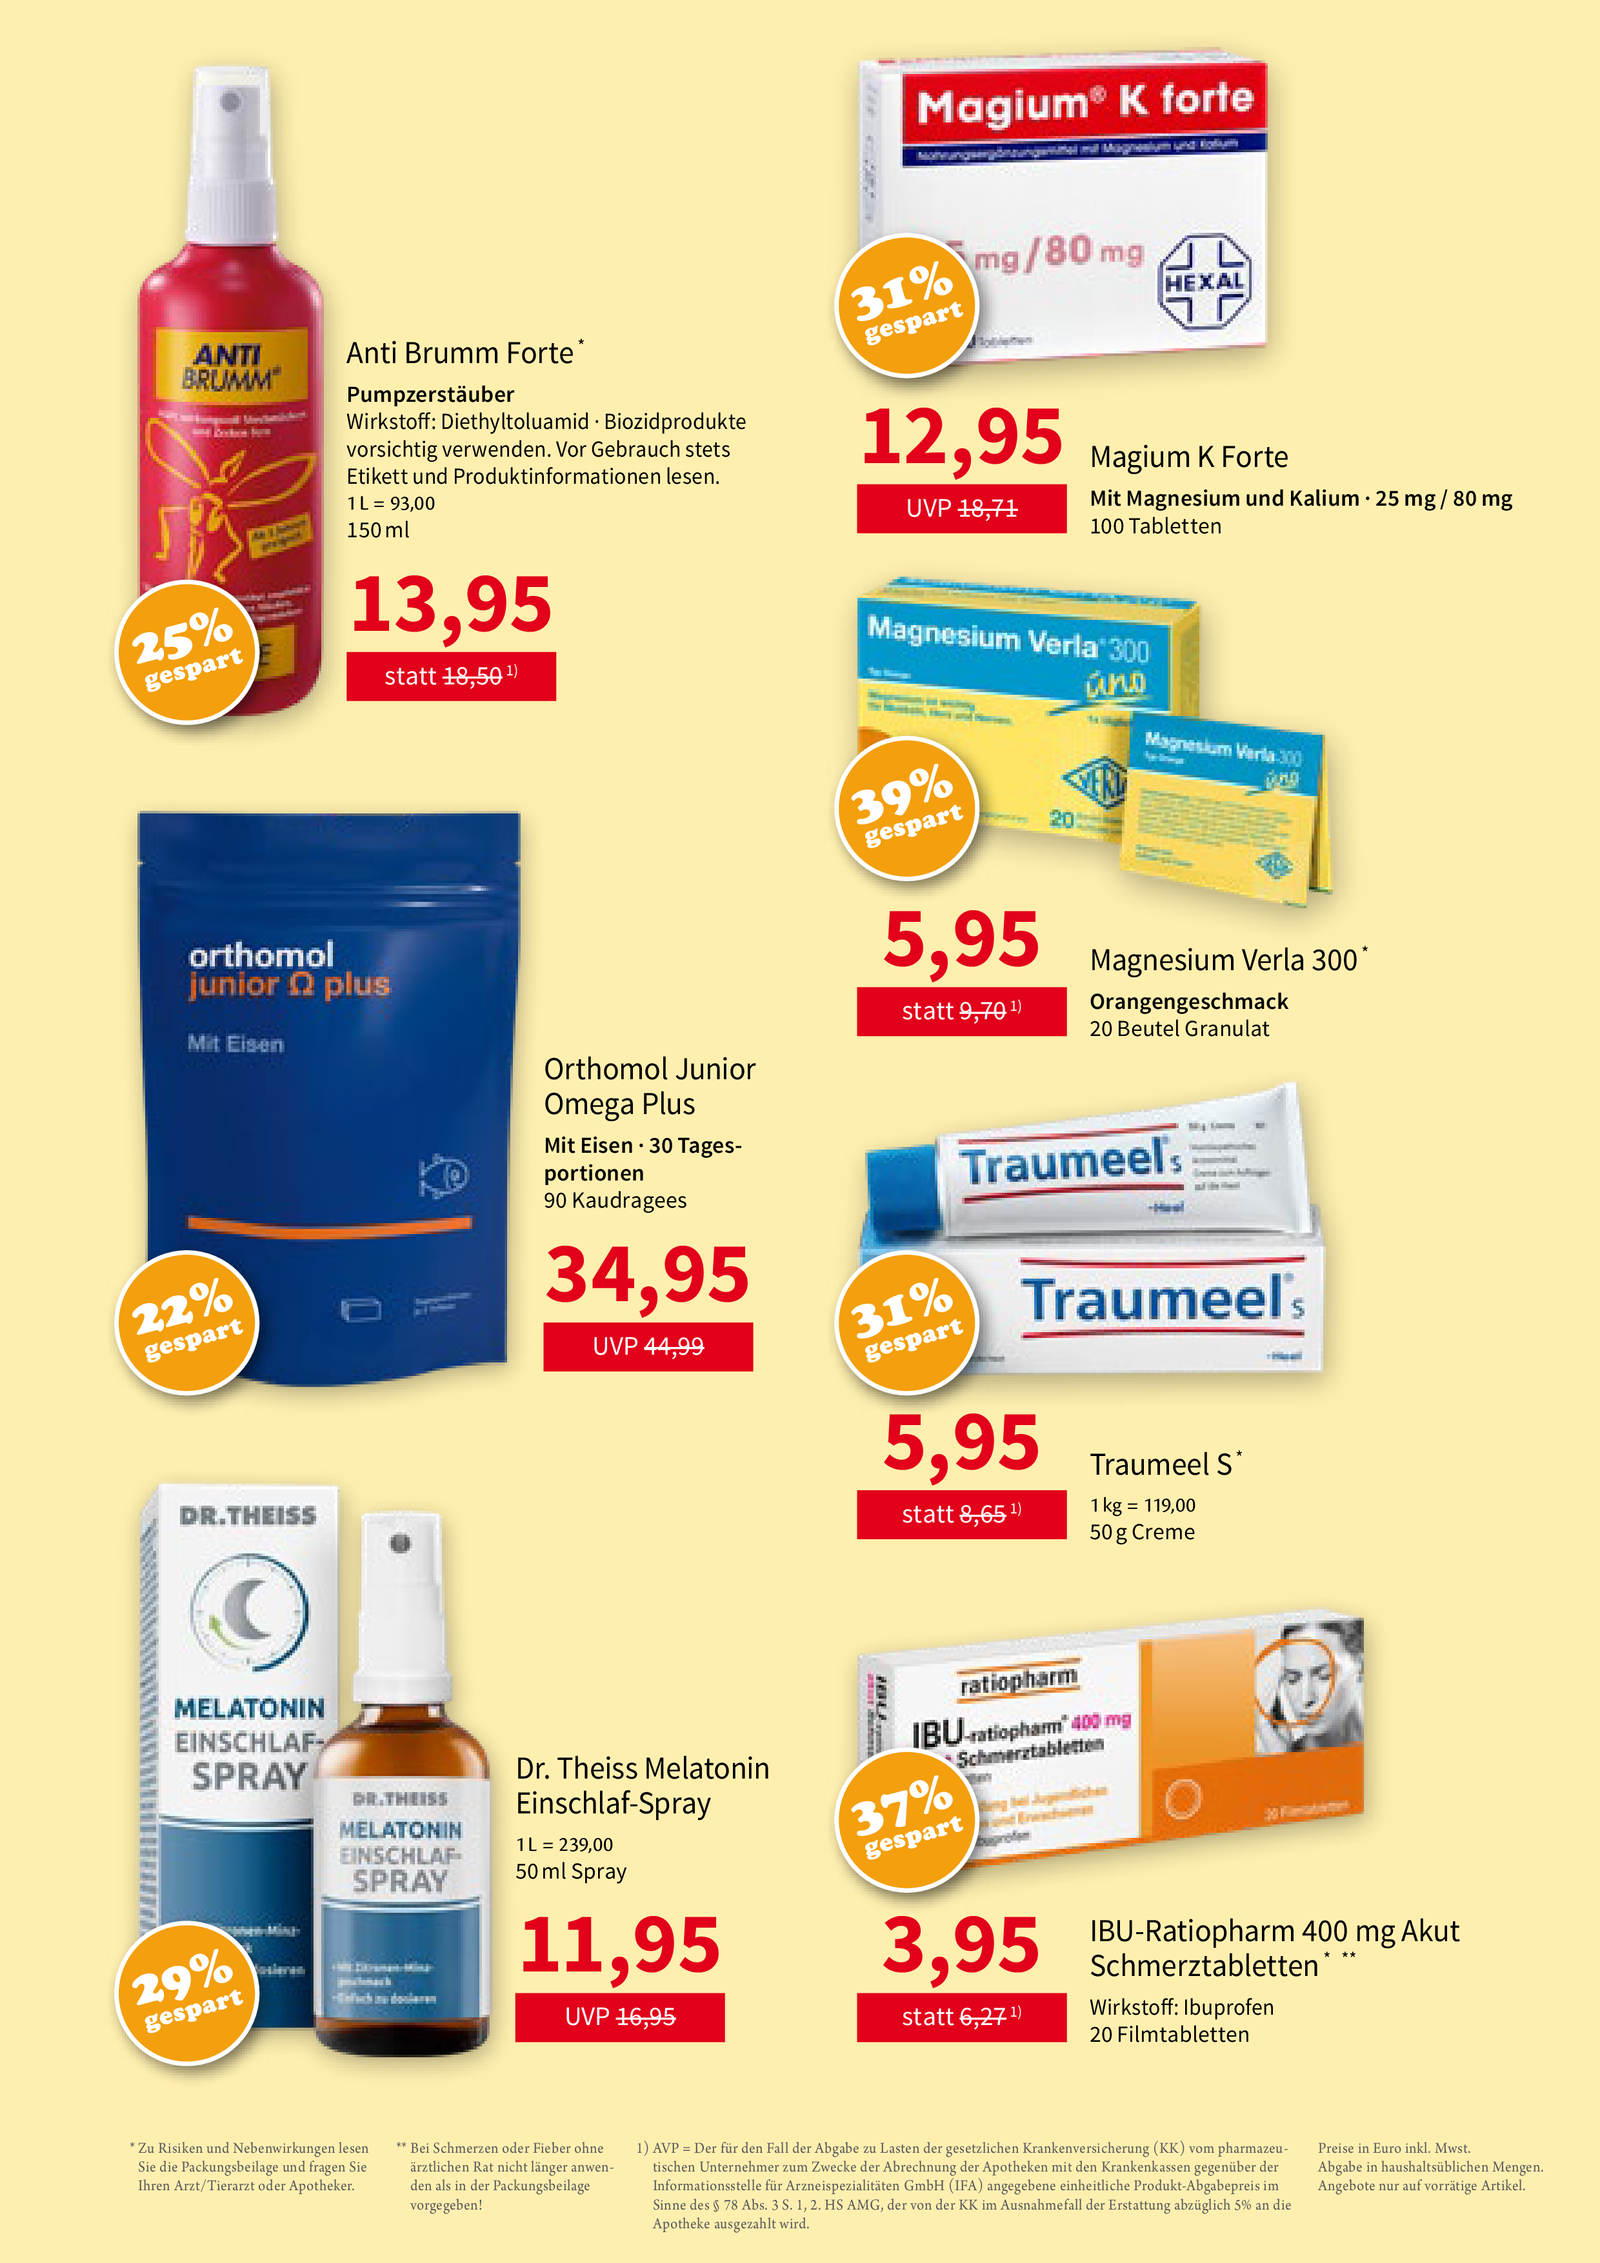 https://mein-uploads.apocdn.net/2175/leaflets/2175_flyer-Seite2.png